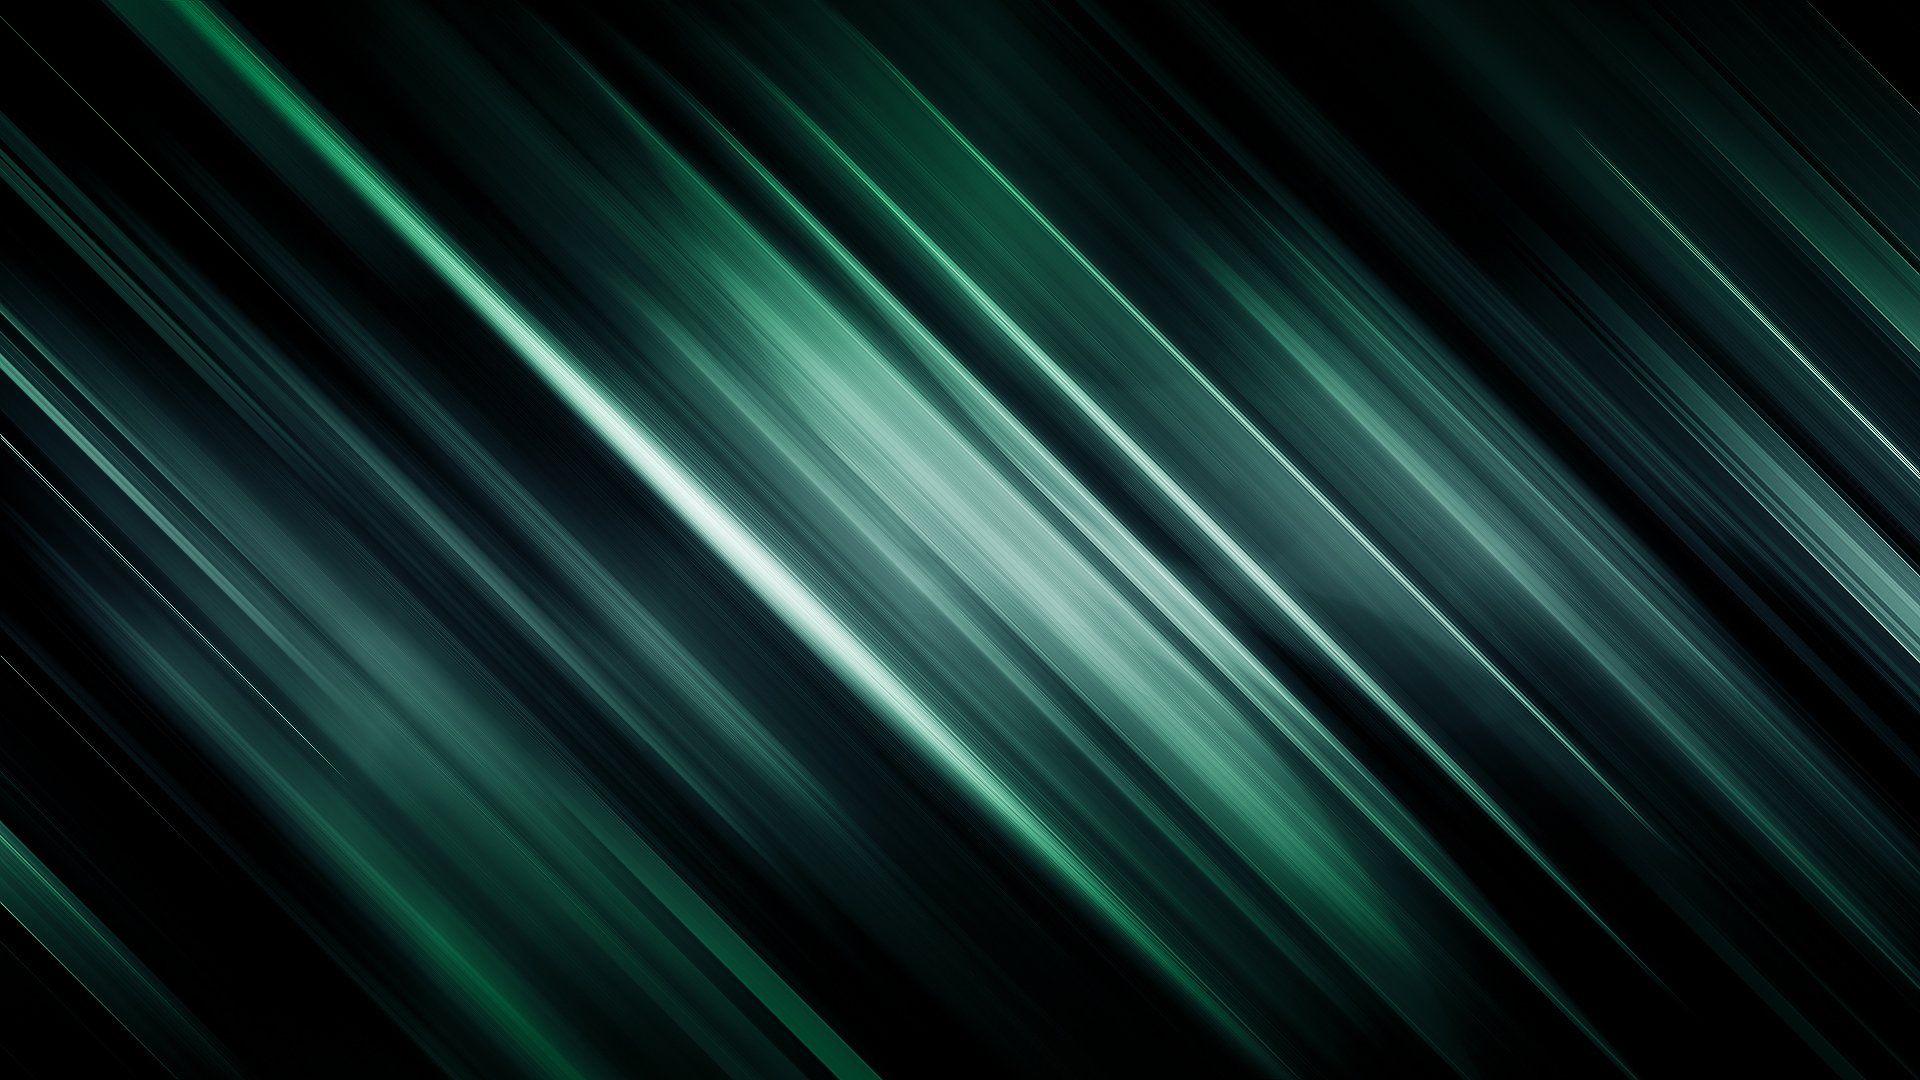 Blue Line picture